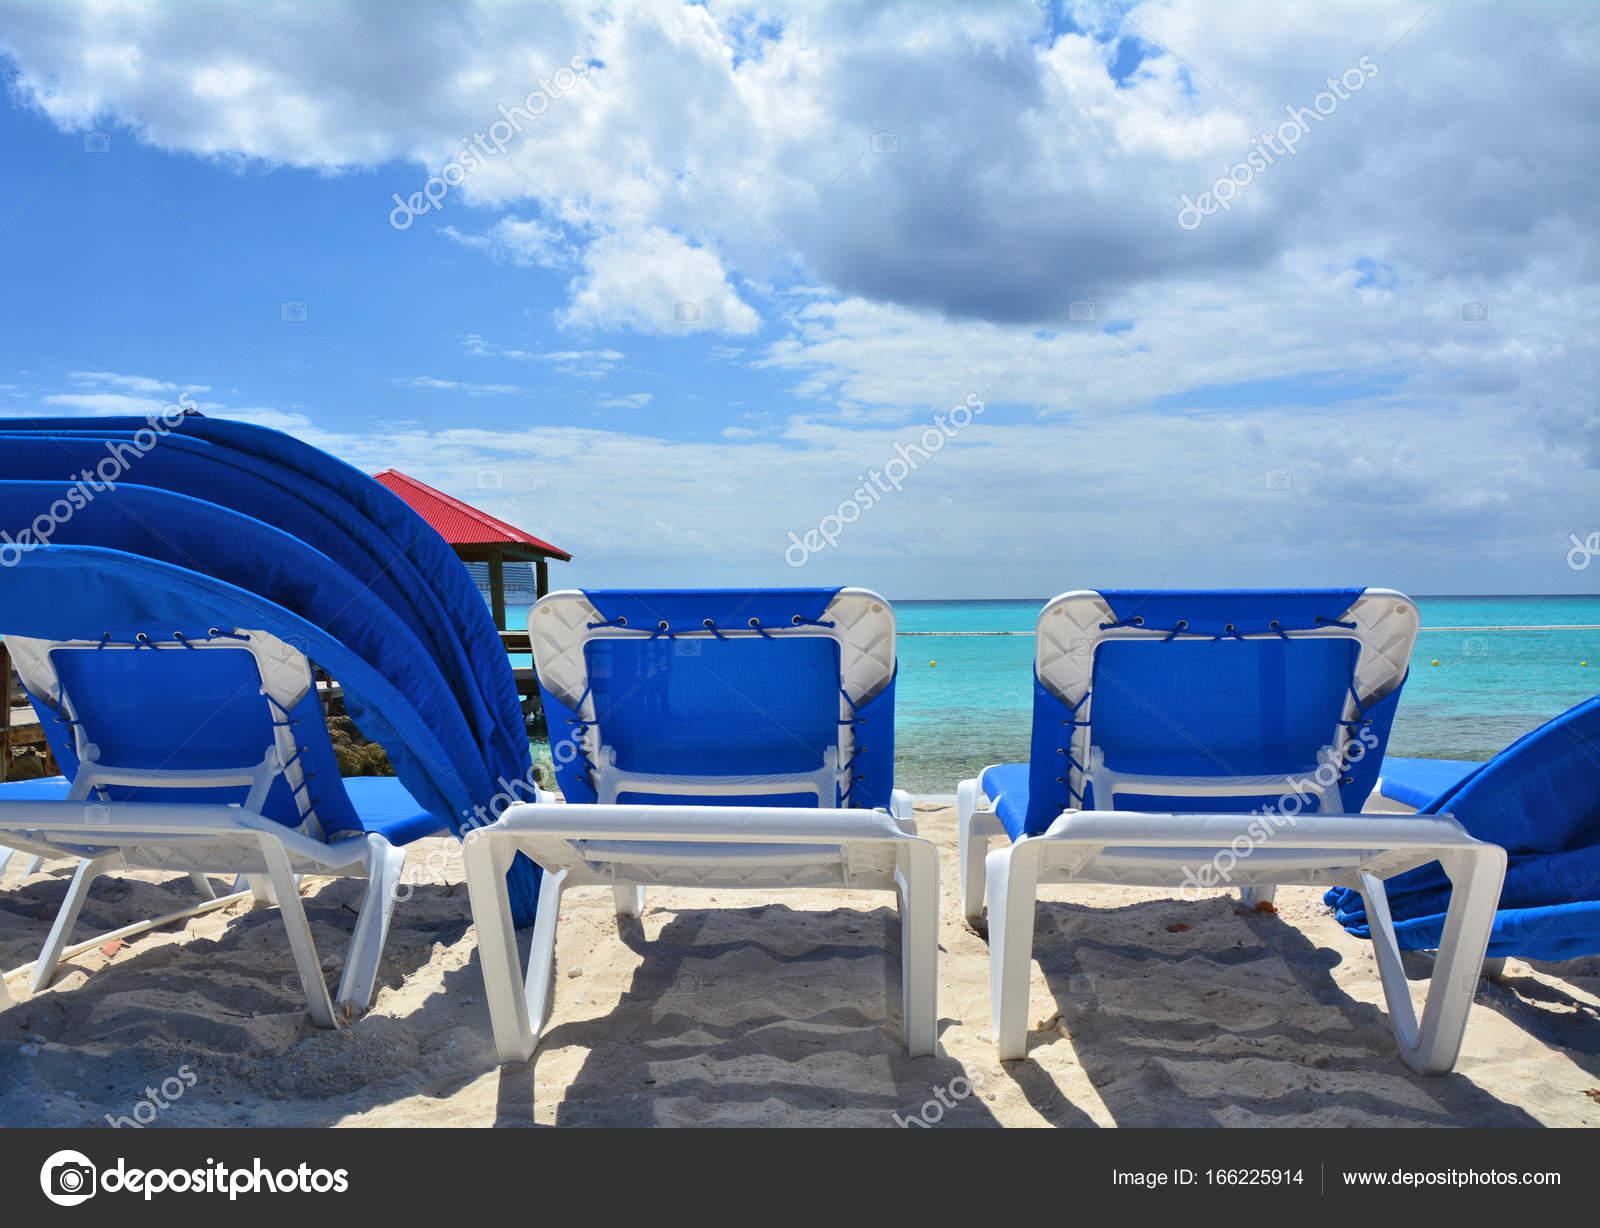 Blue sunbeds on the beach — Stock Photo © Studiobarcelona #166225914